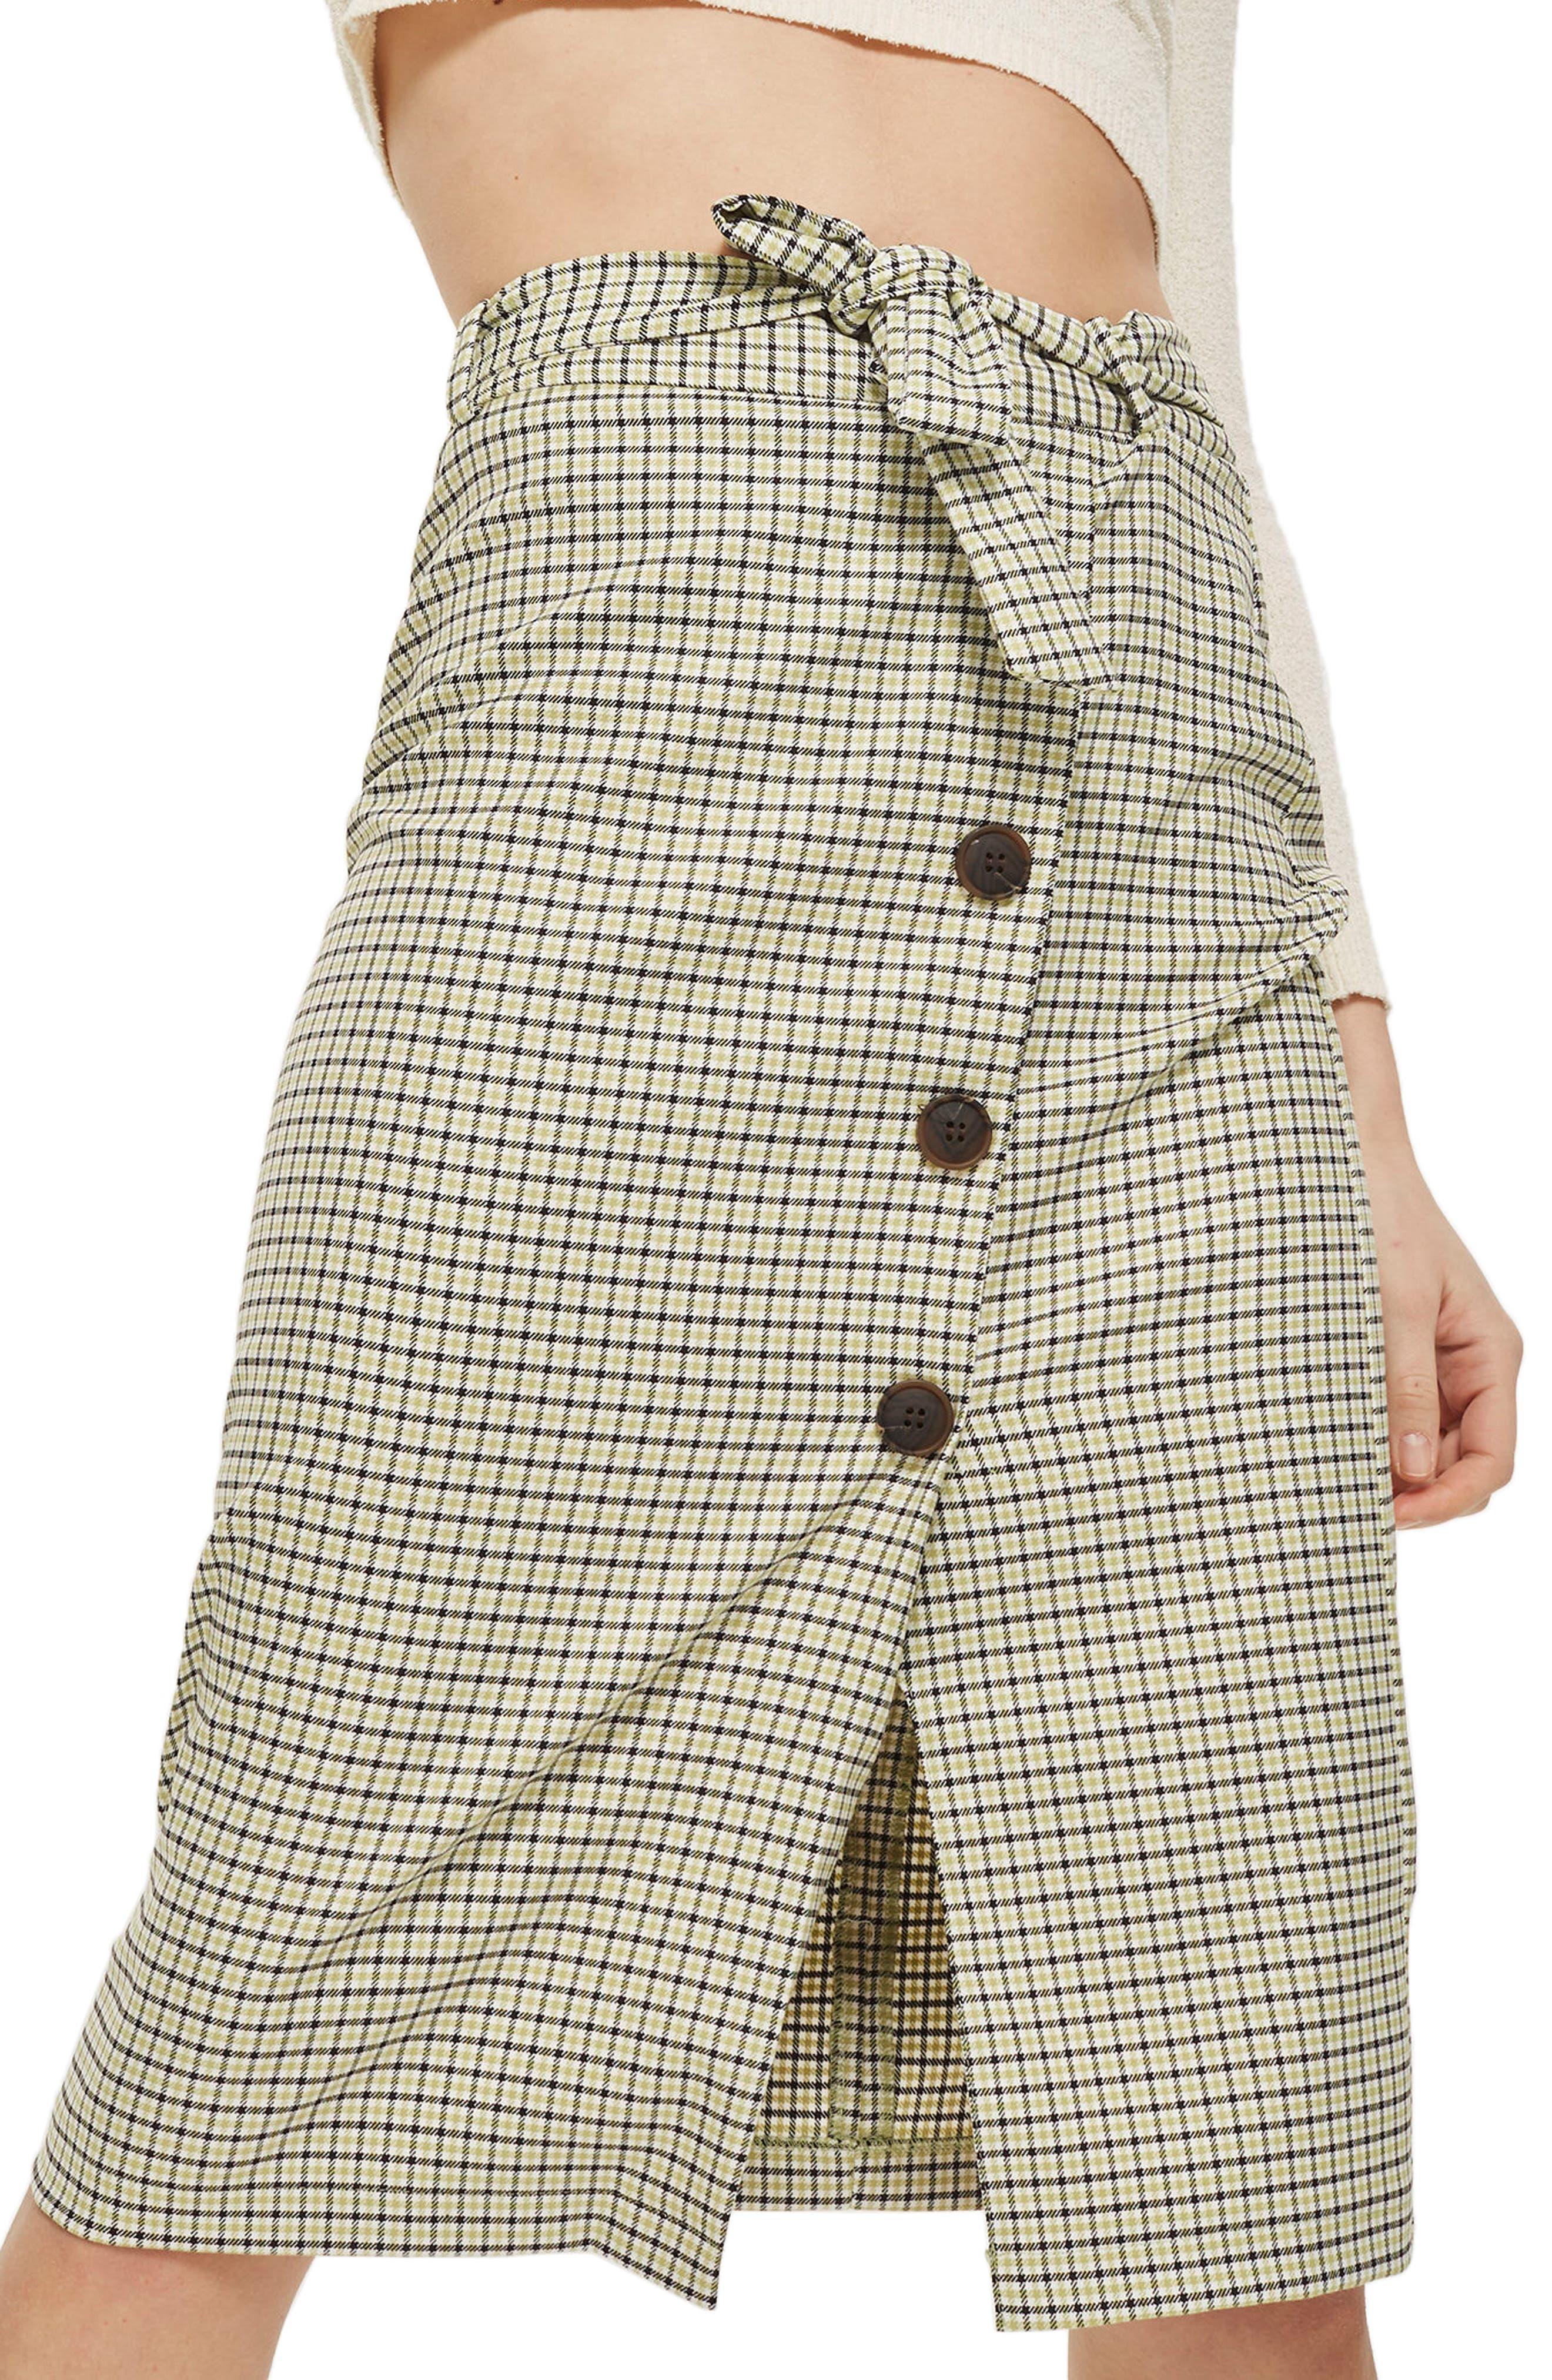 Topshop Button Plaid Skirt